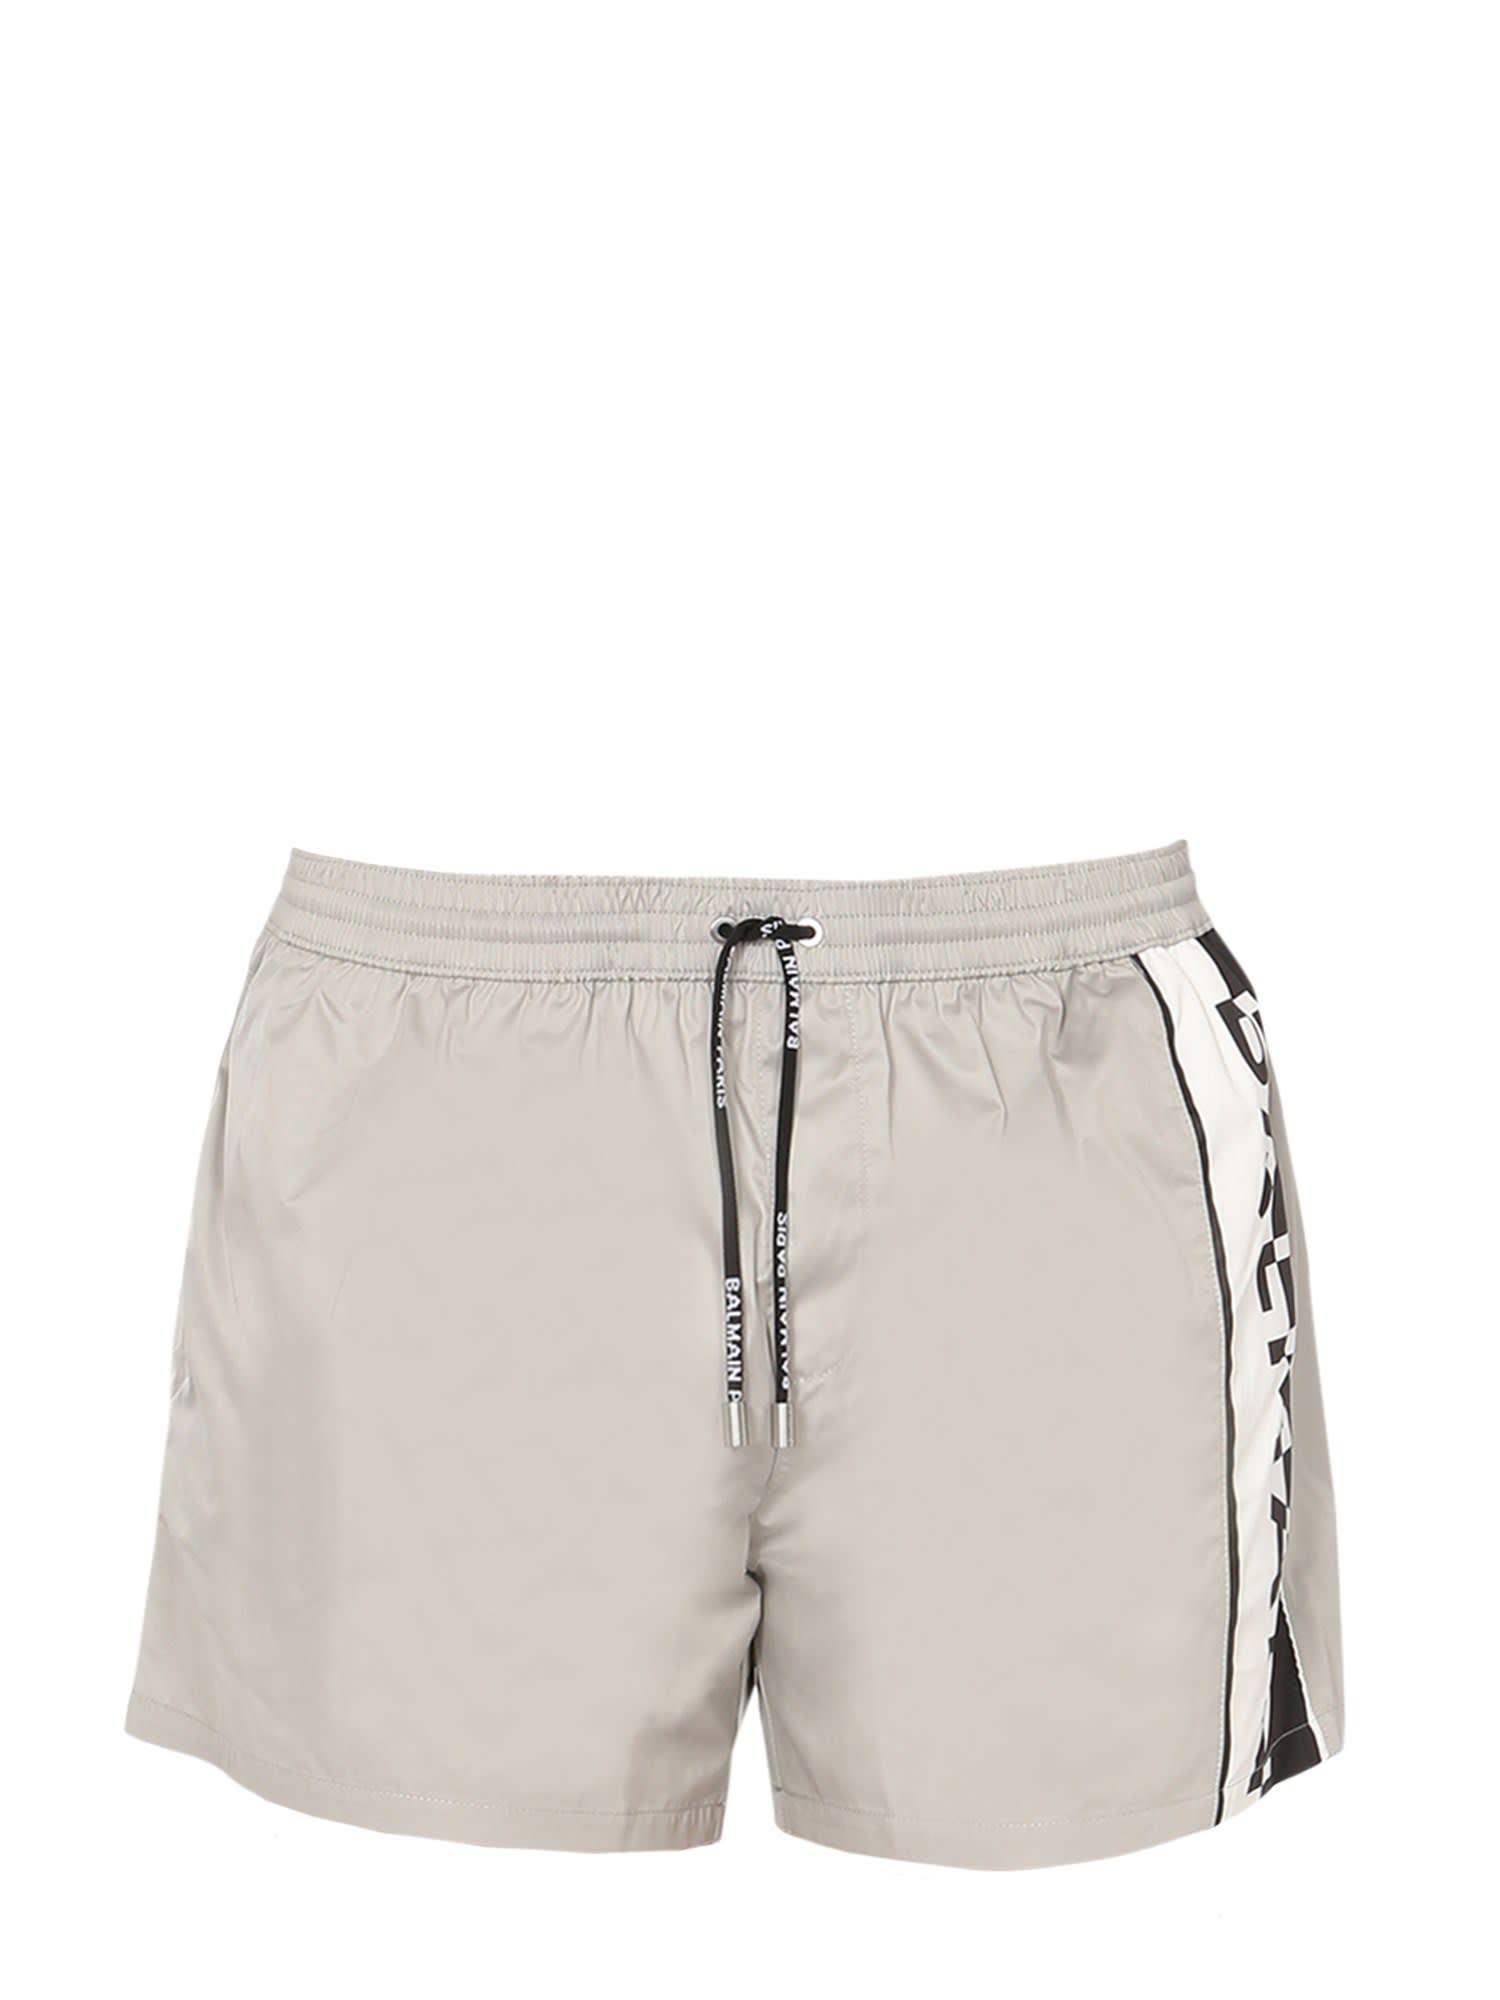 Balmain Shorts SWIMSUIT BOXERS